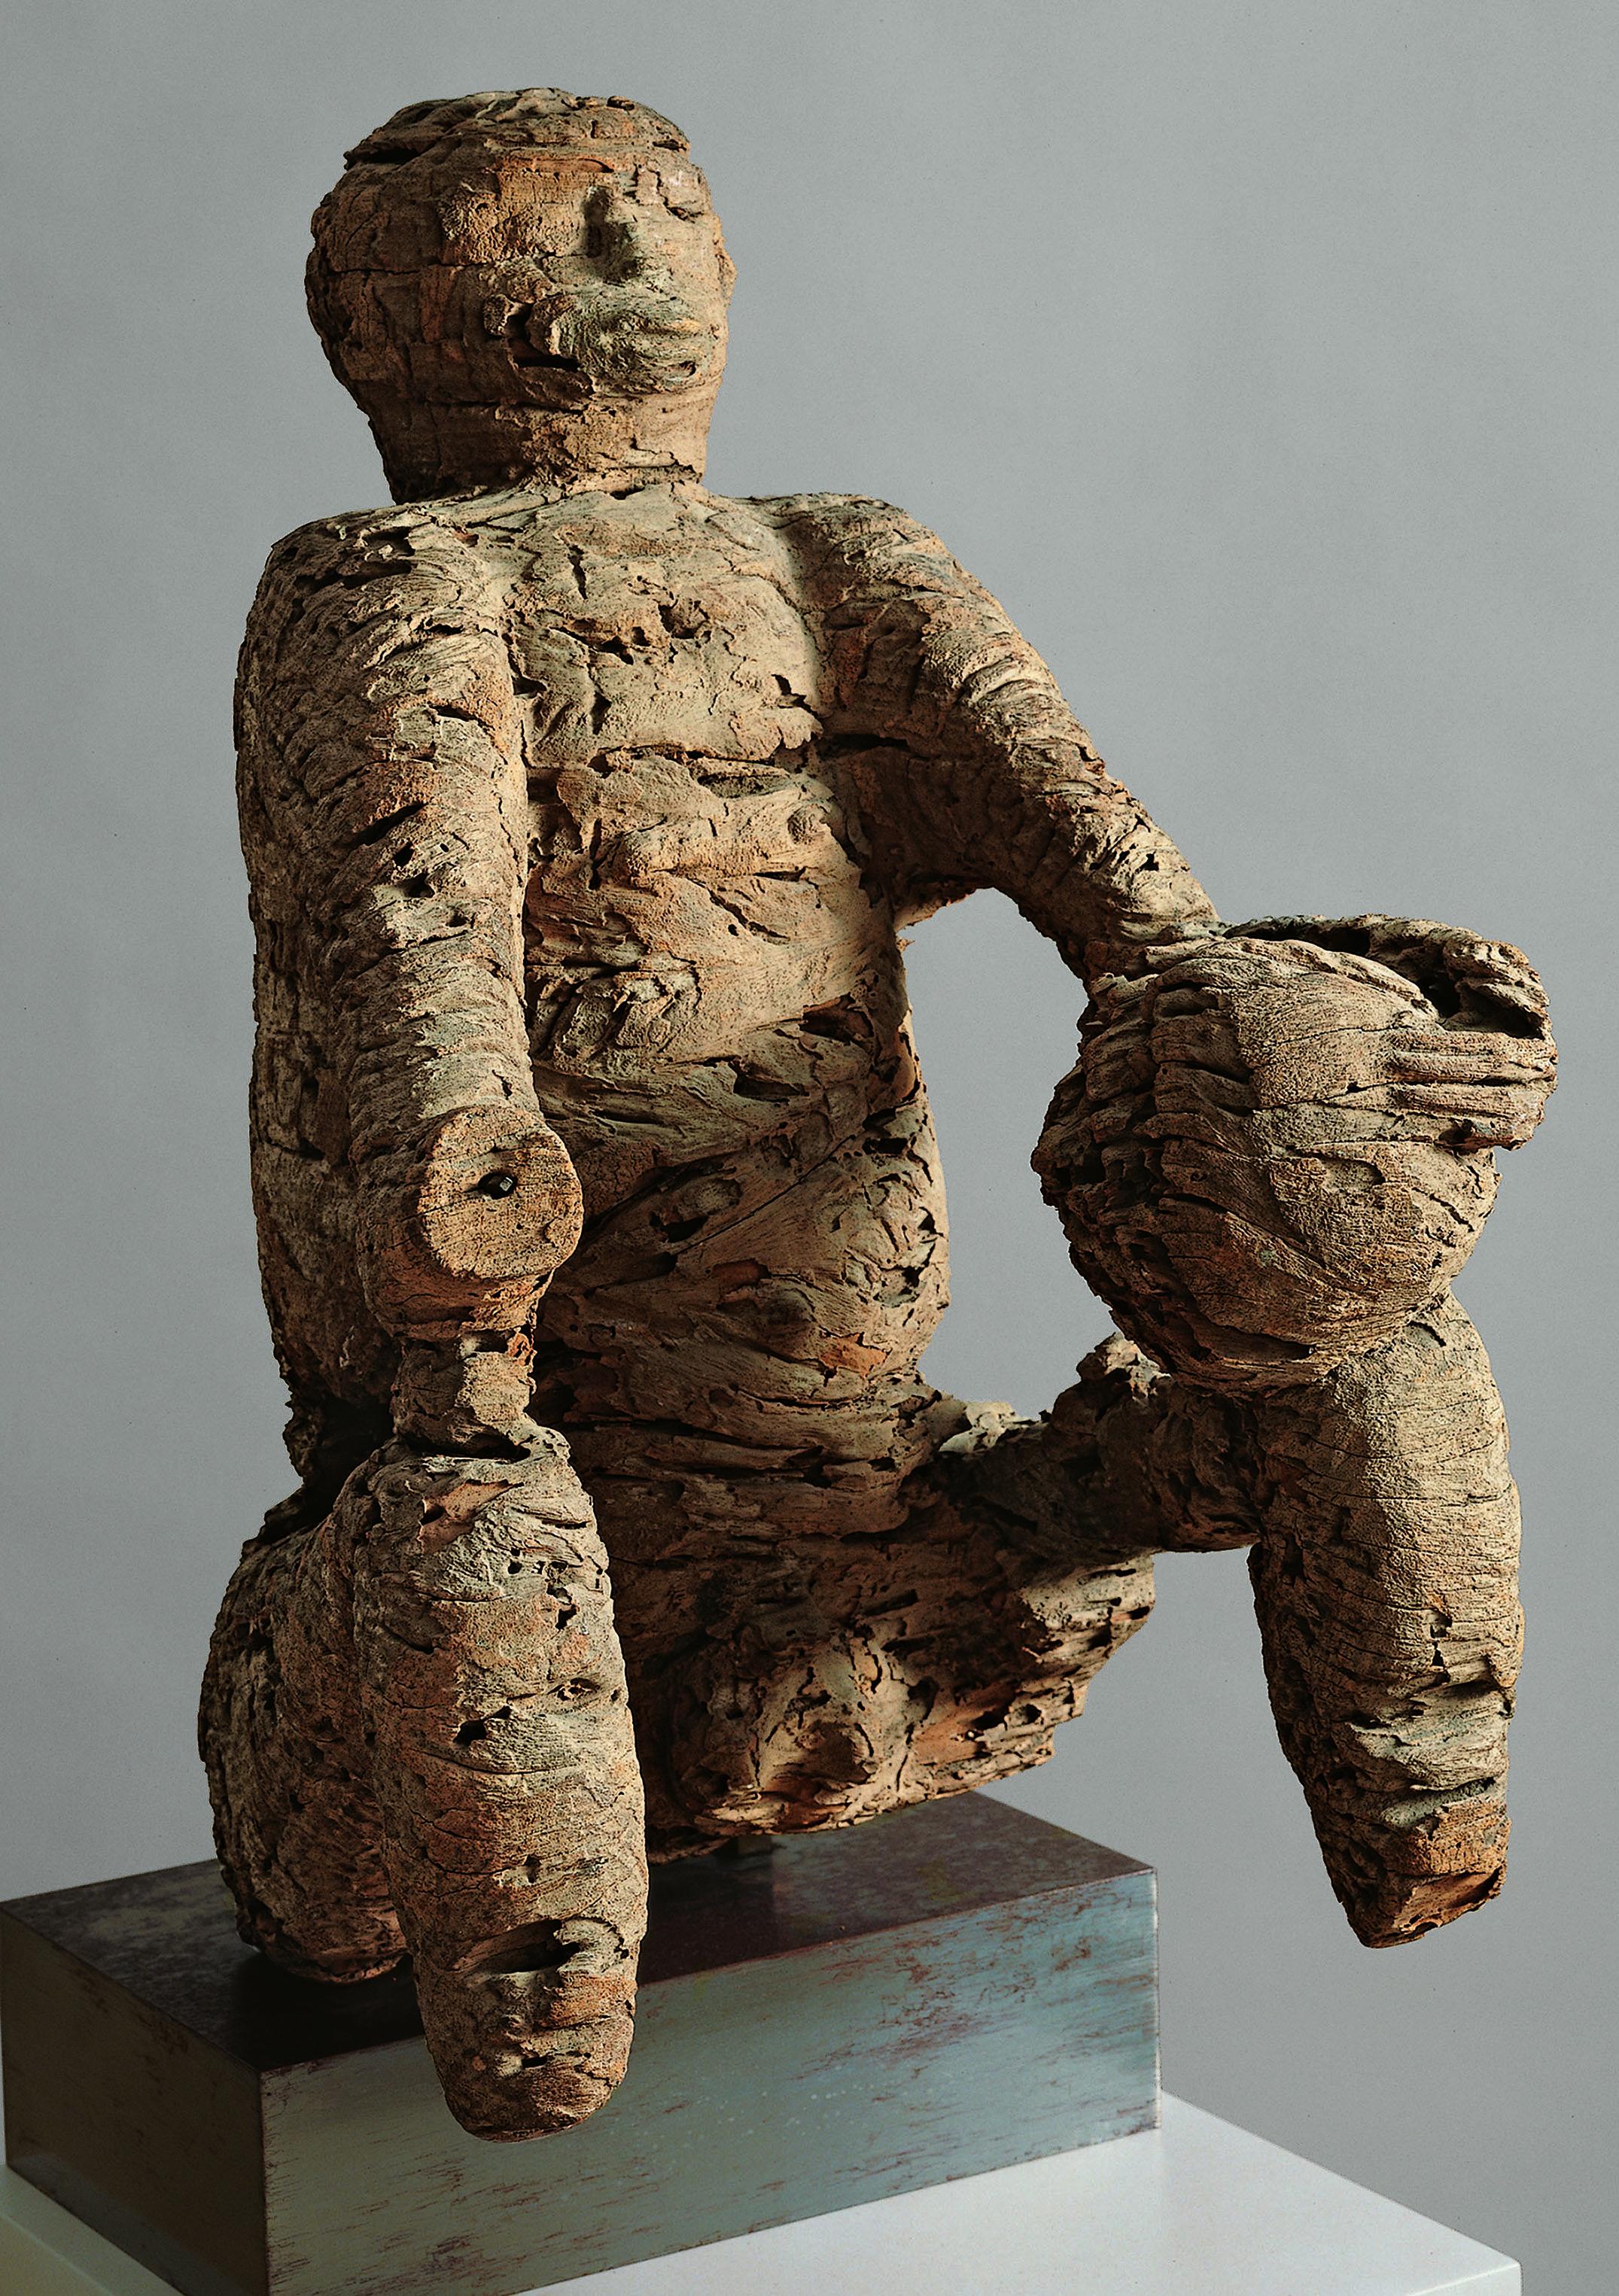 Seated Male Figure with Trophy Head: Chief Mabana - Mbembe peoples; Ewayon River region, Cross River Province, Nigeria -helene-kamer-interview-african-art-dealer-04.jpg (2151×3051)